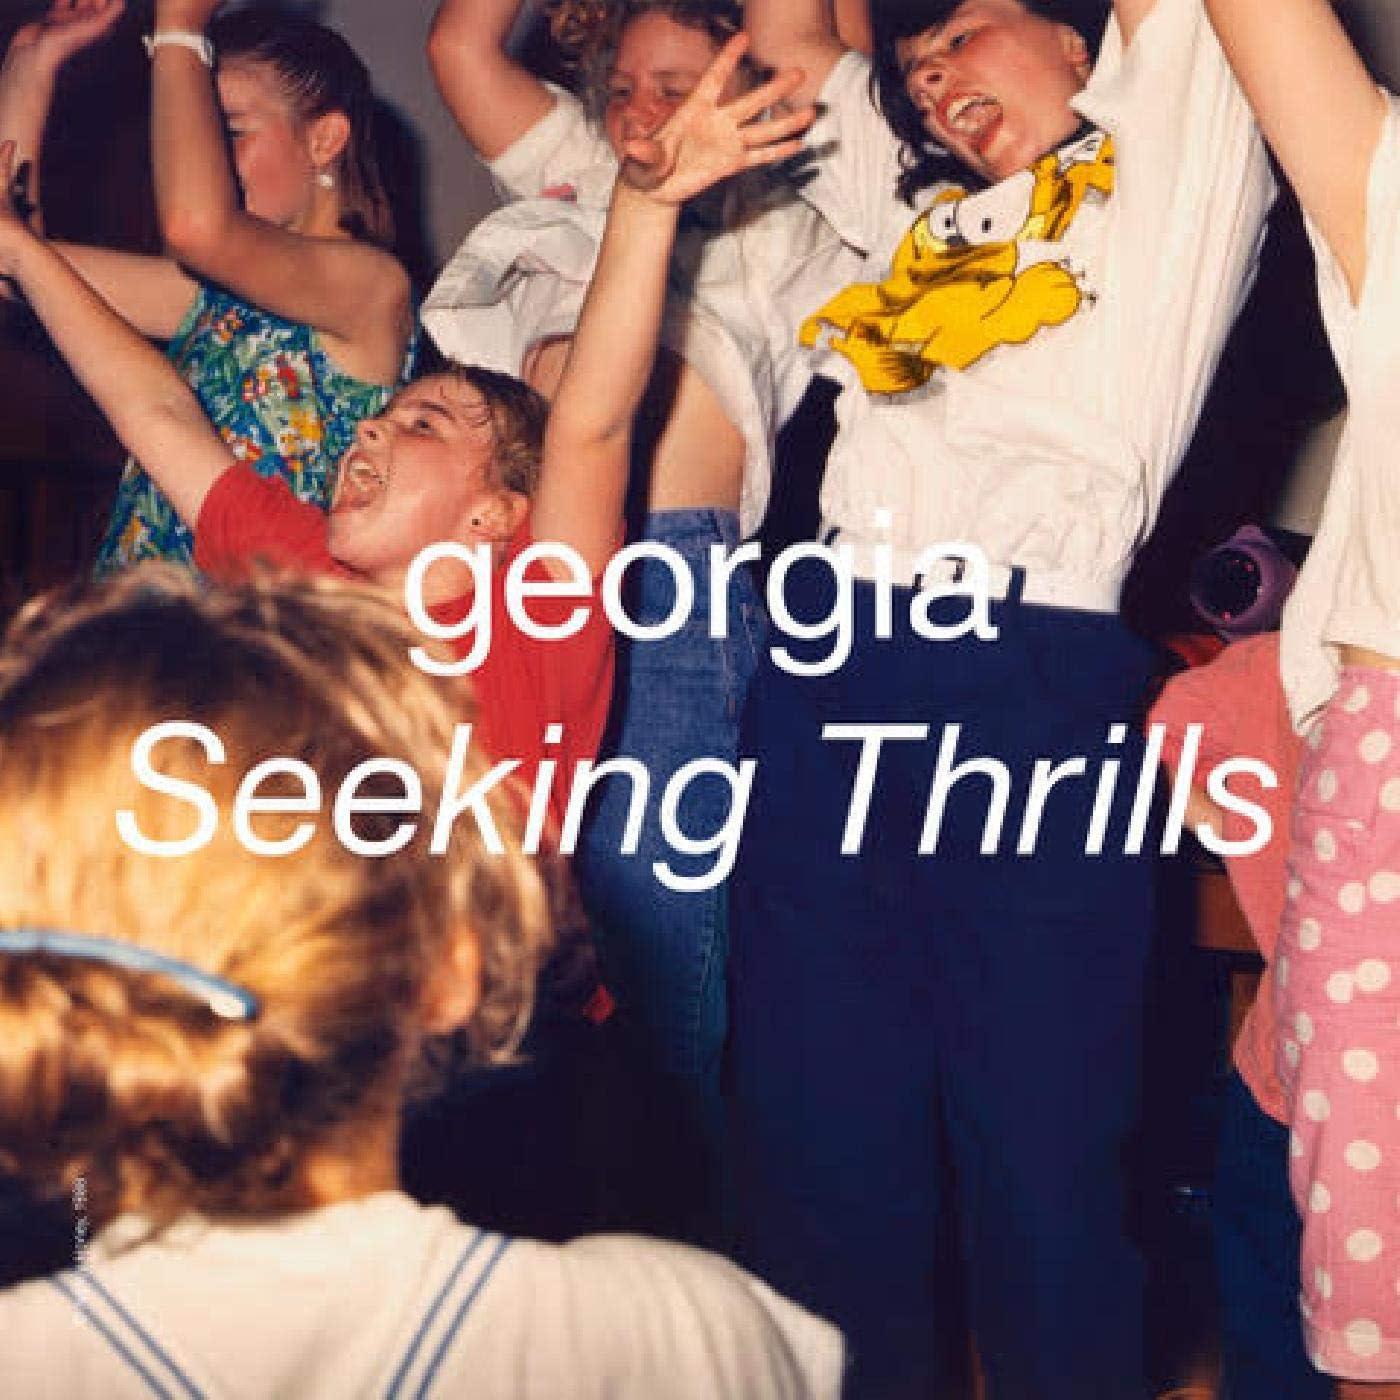 「Seeking Thrills / Georgia」の画像検索結果